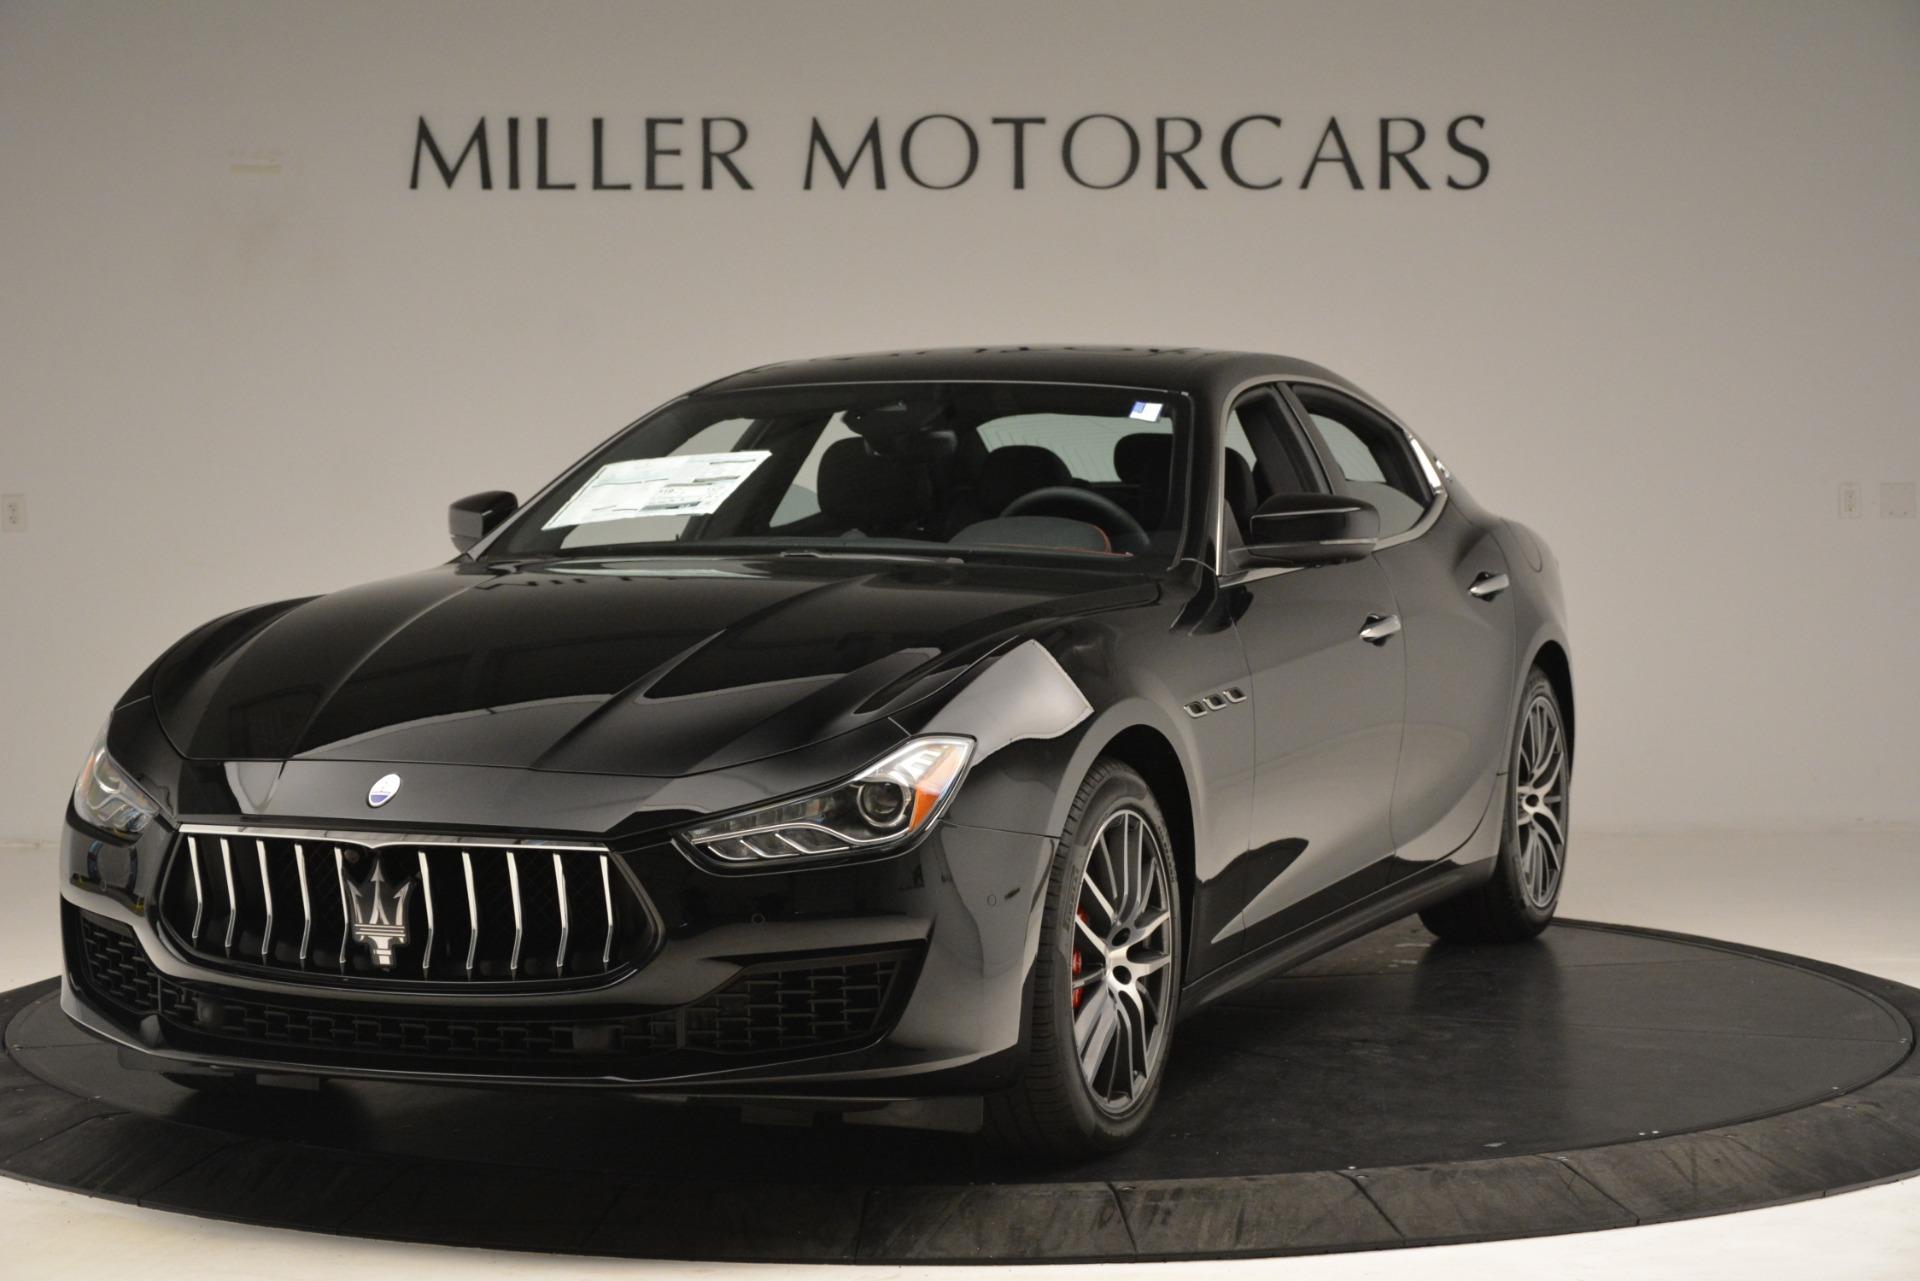 New 2019 Maserati Ghibli S Q4 for sale Sold at Alfa Romeo of Greenwich in Greenwich CT 06830 1